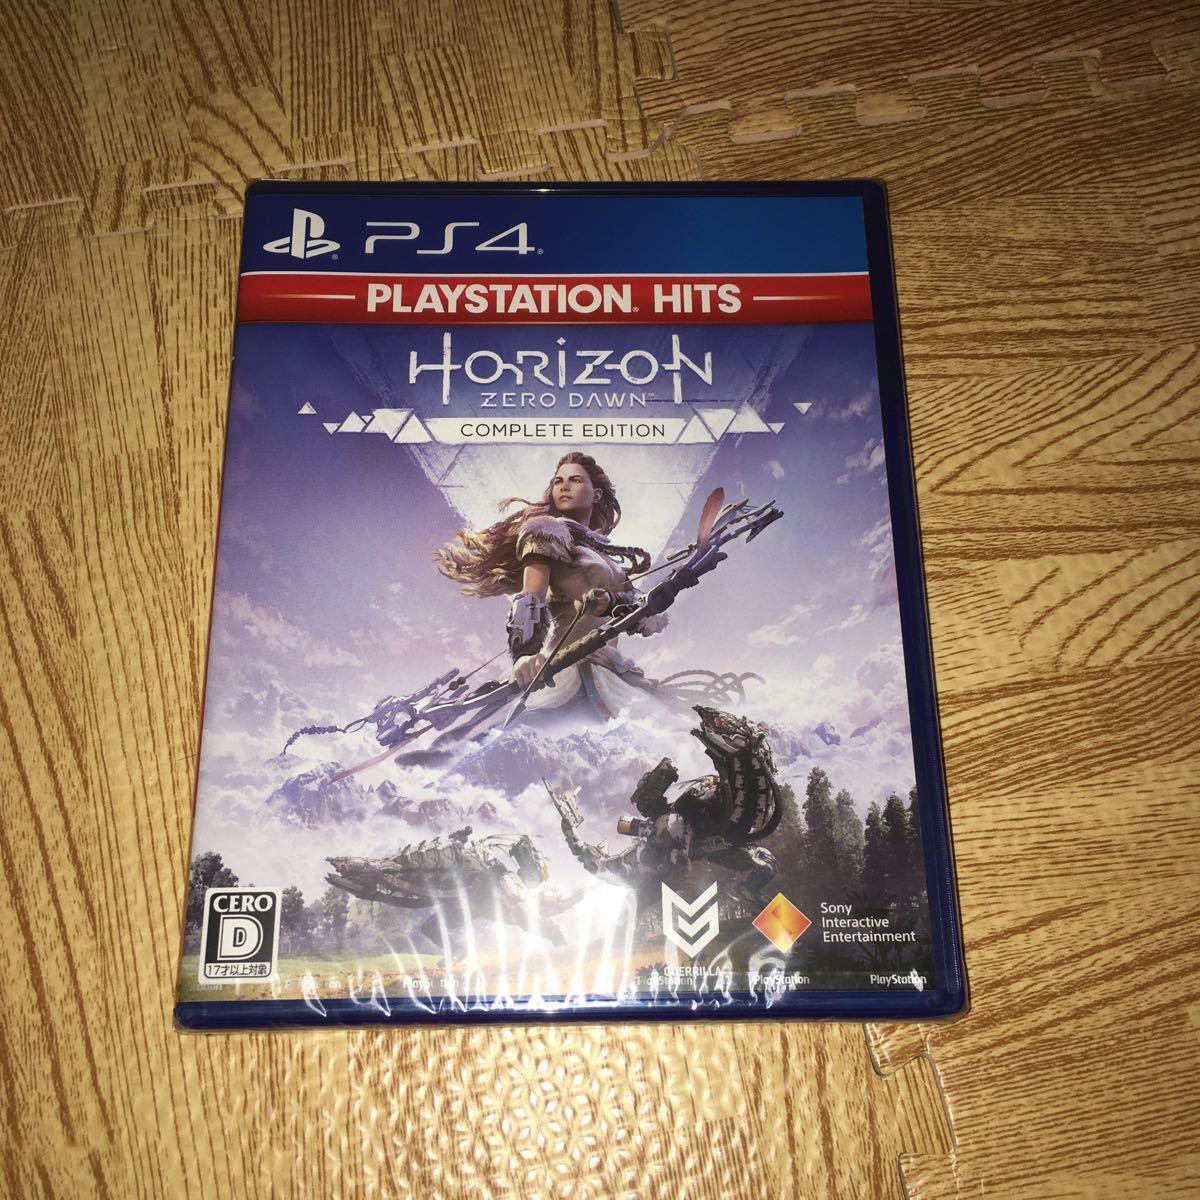 【PS4】 Horizon Zero Dawn [Complete Edition PlayStation Hits]